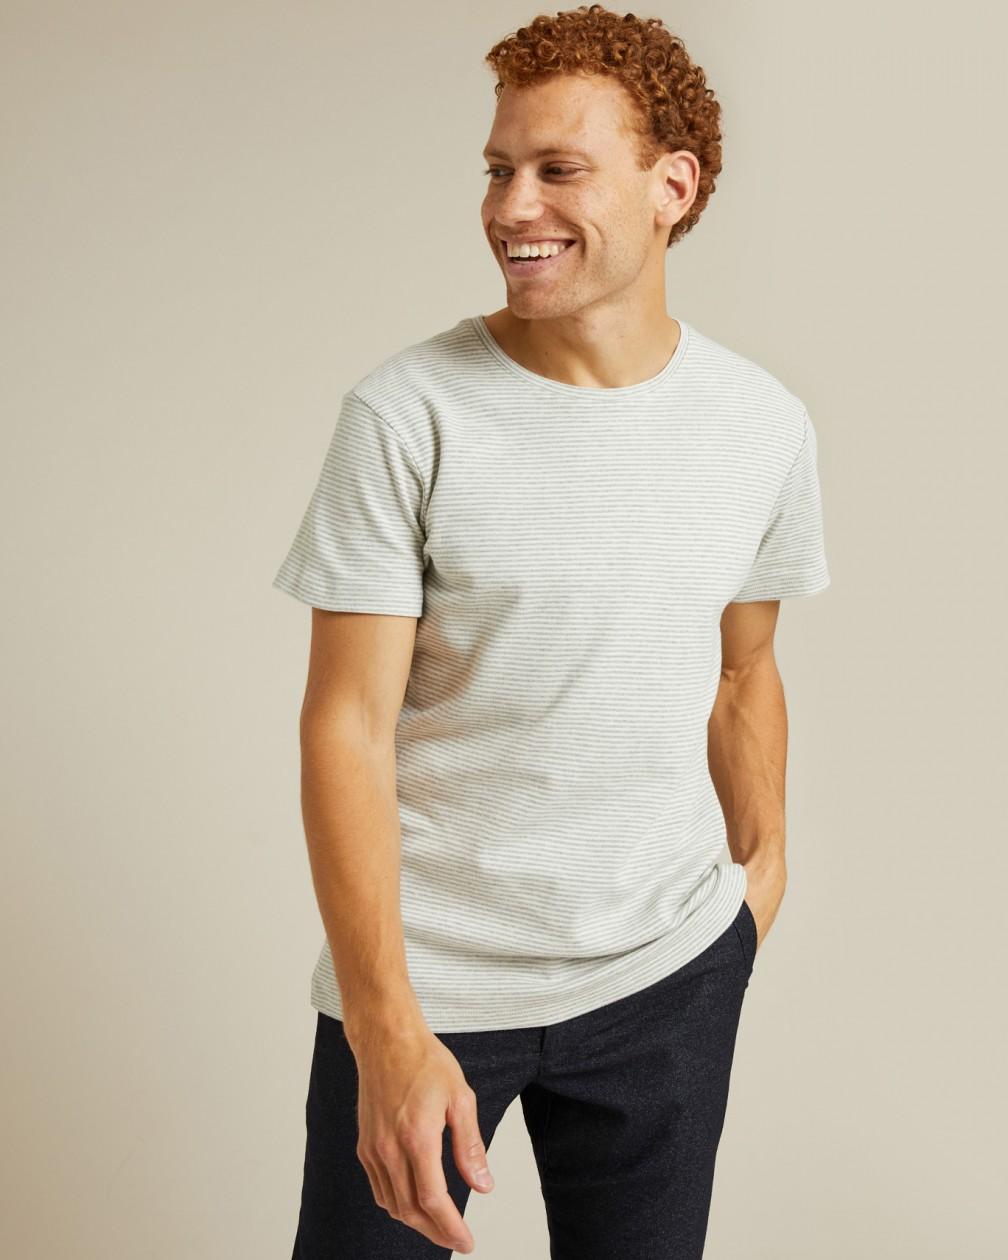 T-shirt saint-ouen